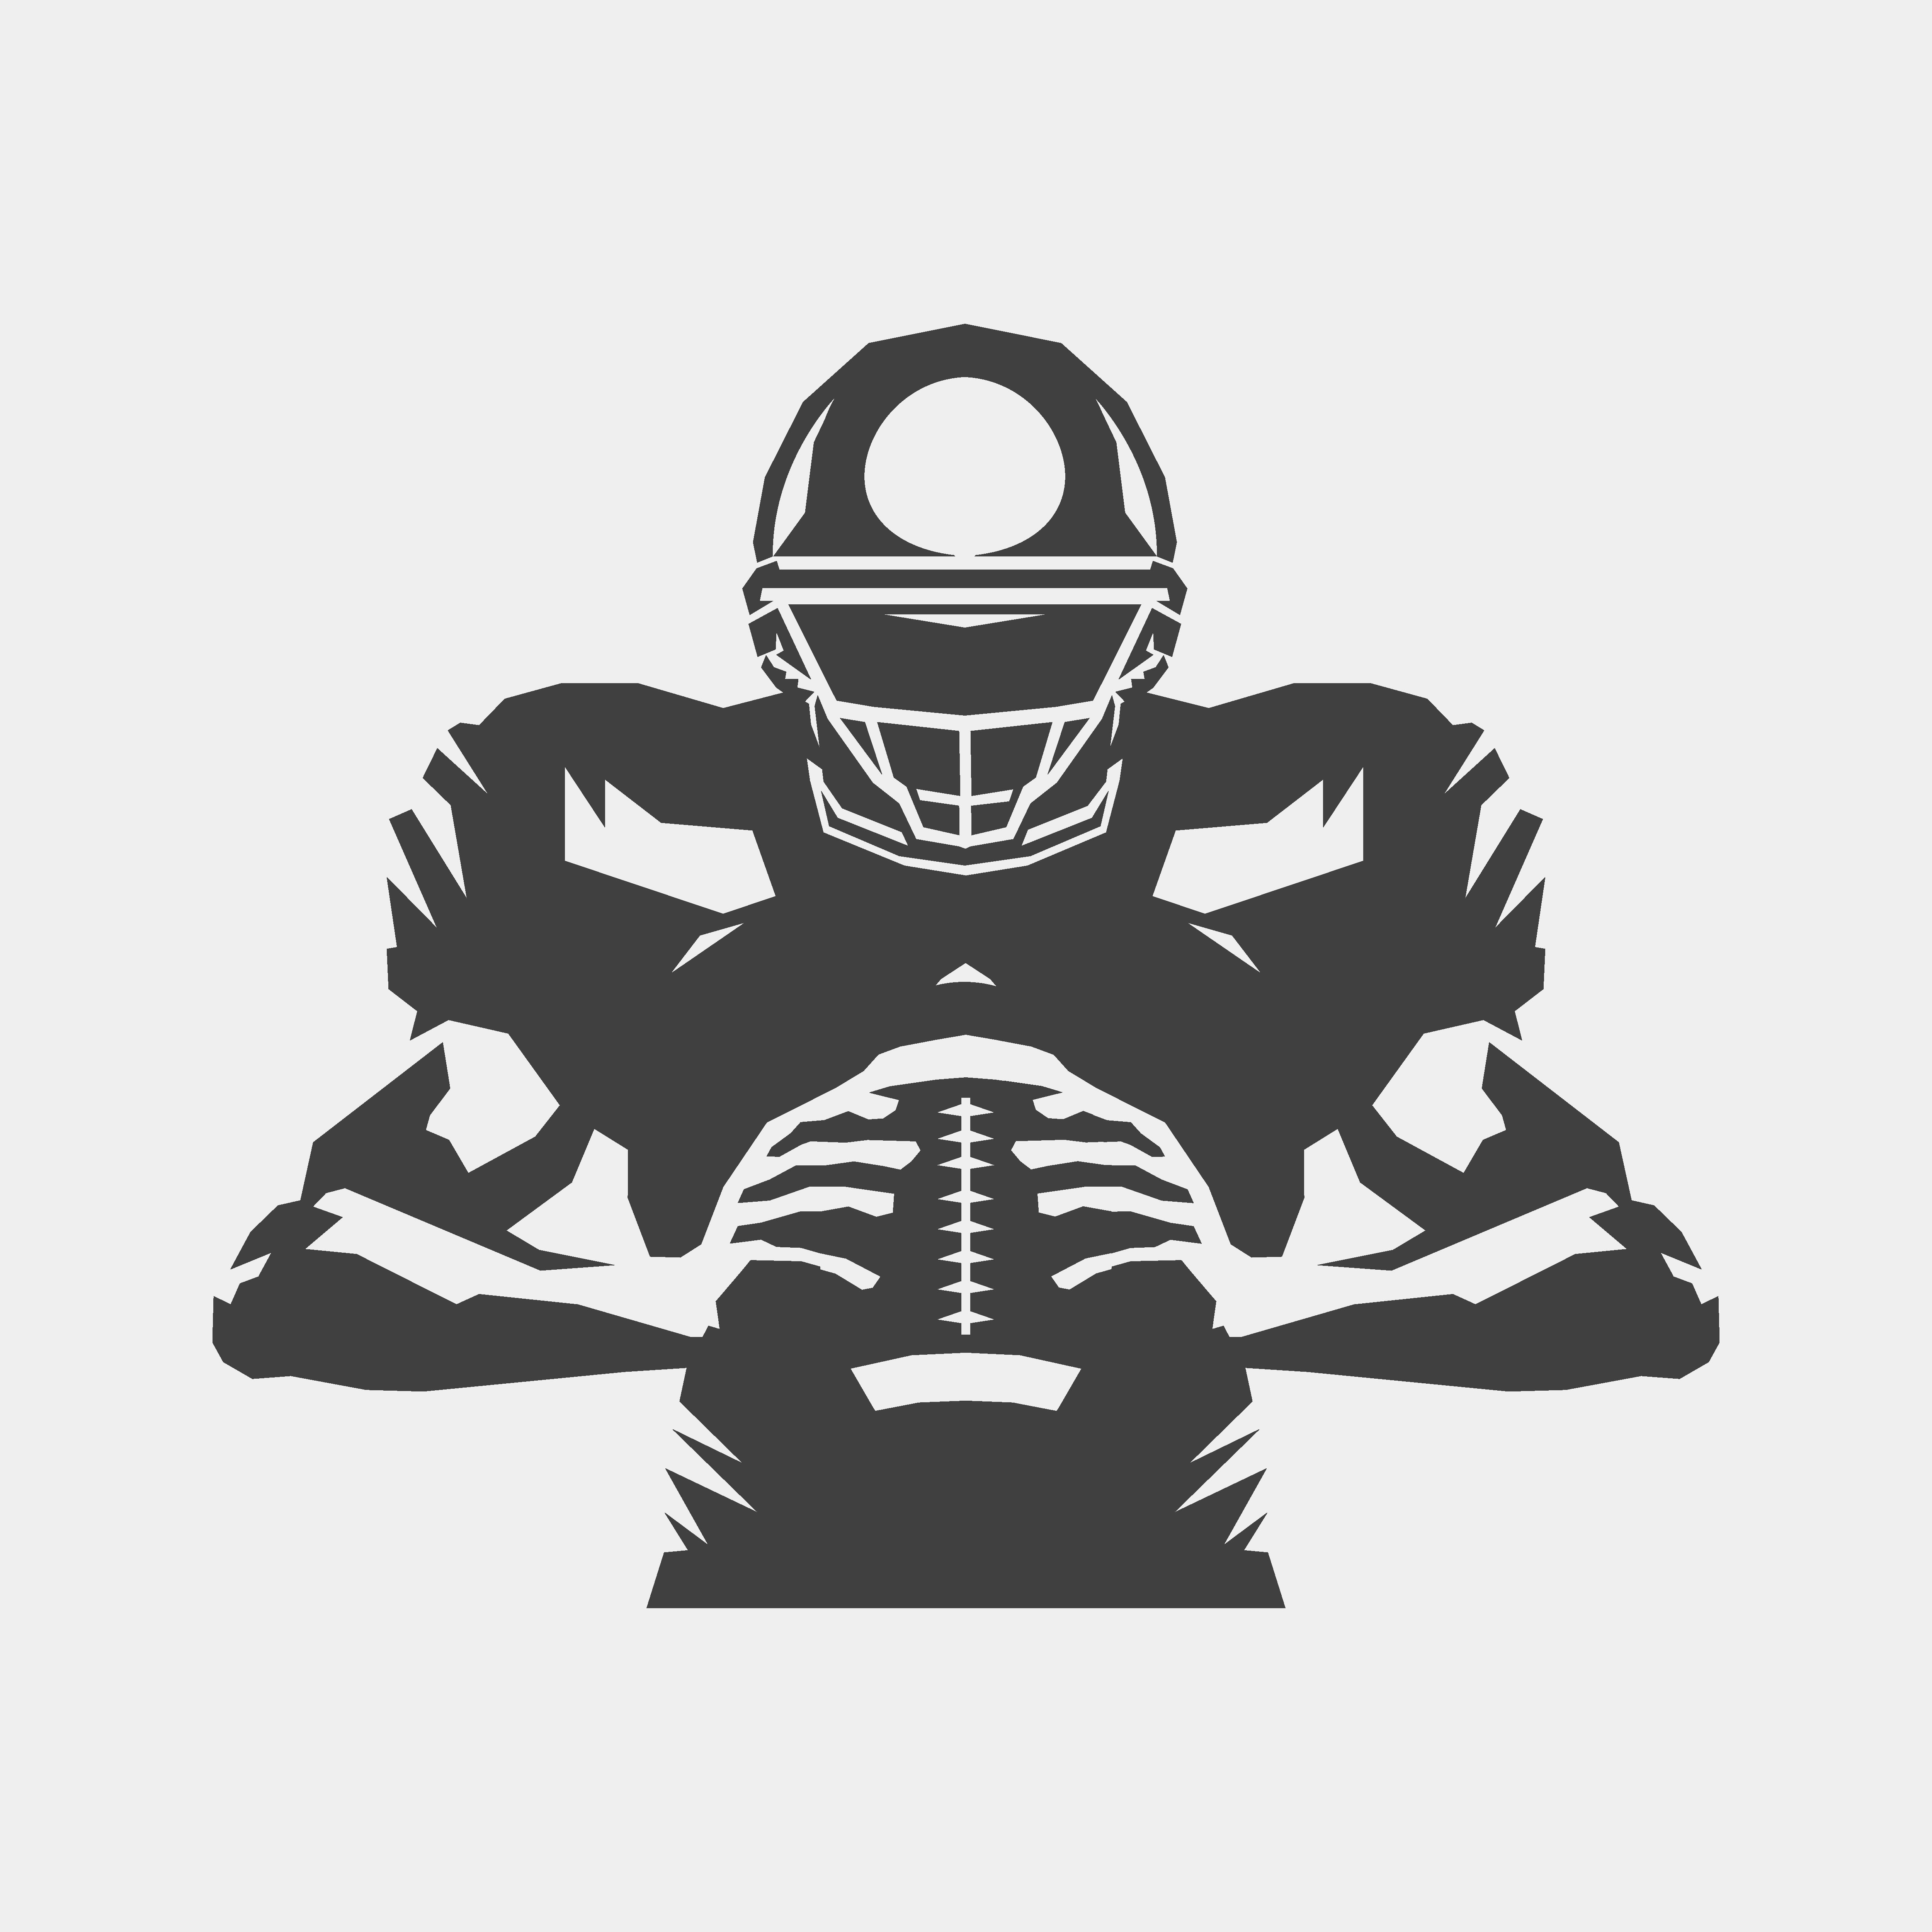 American football player - Download Free Vectors, Clipart ... (5000 x 5000 Pixel)